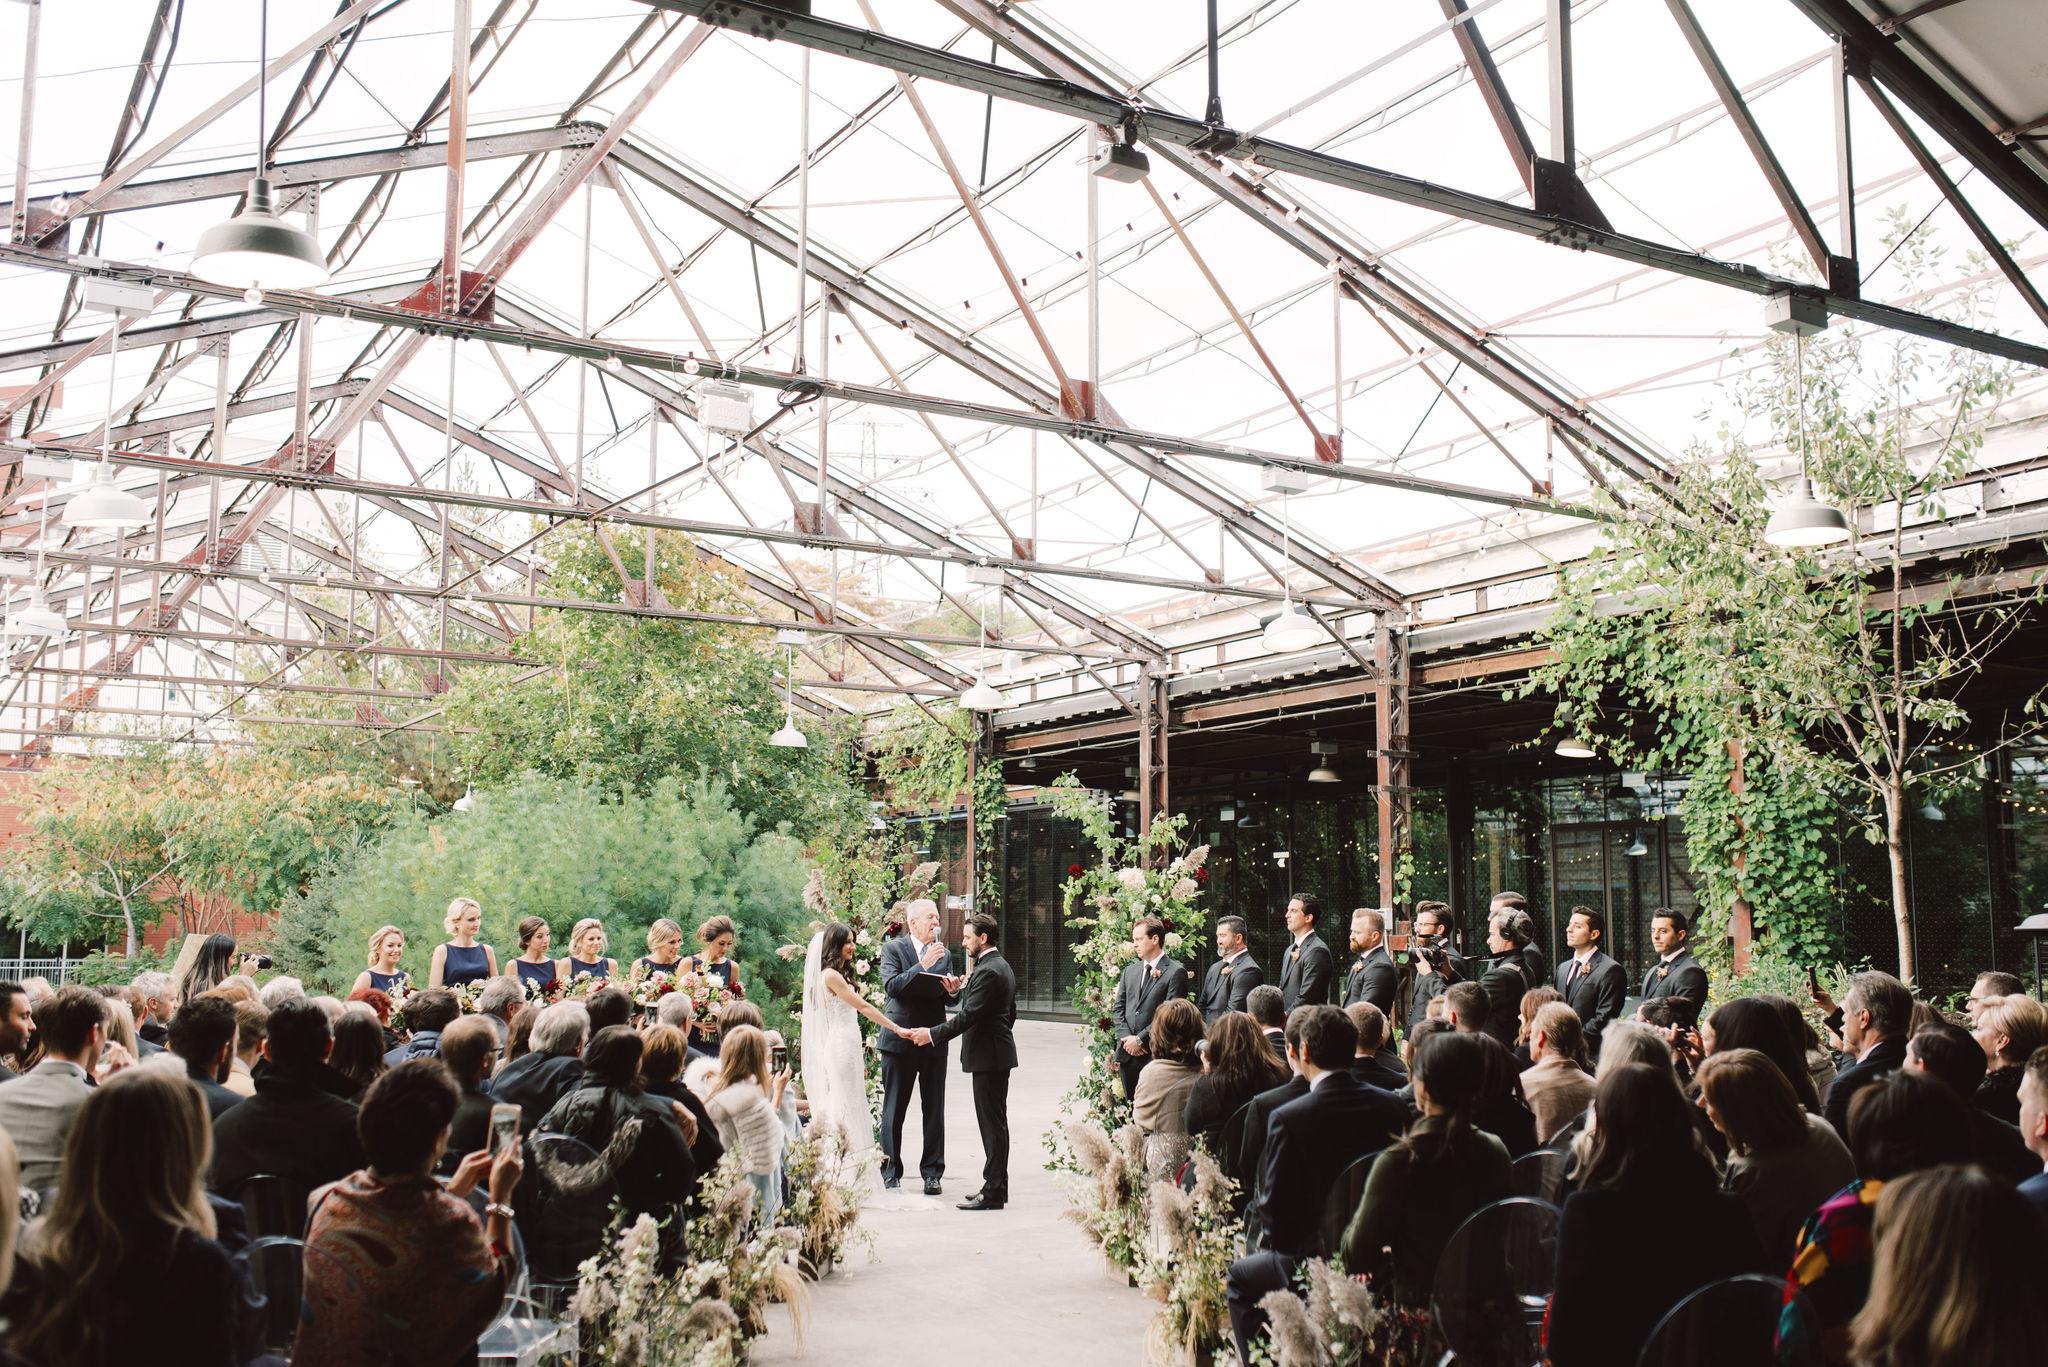 1065-artiese-evergreen-brickworks-wedding-ashleycraig-26767.jpg